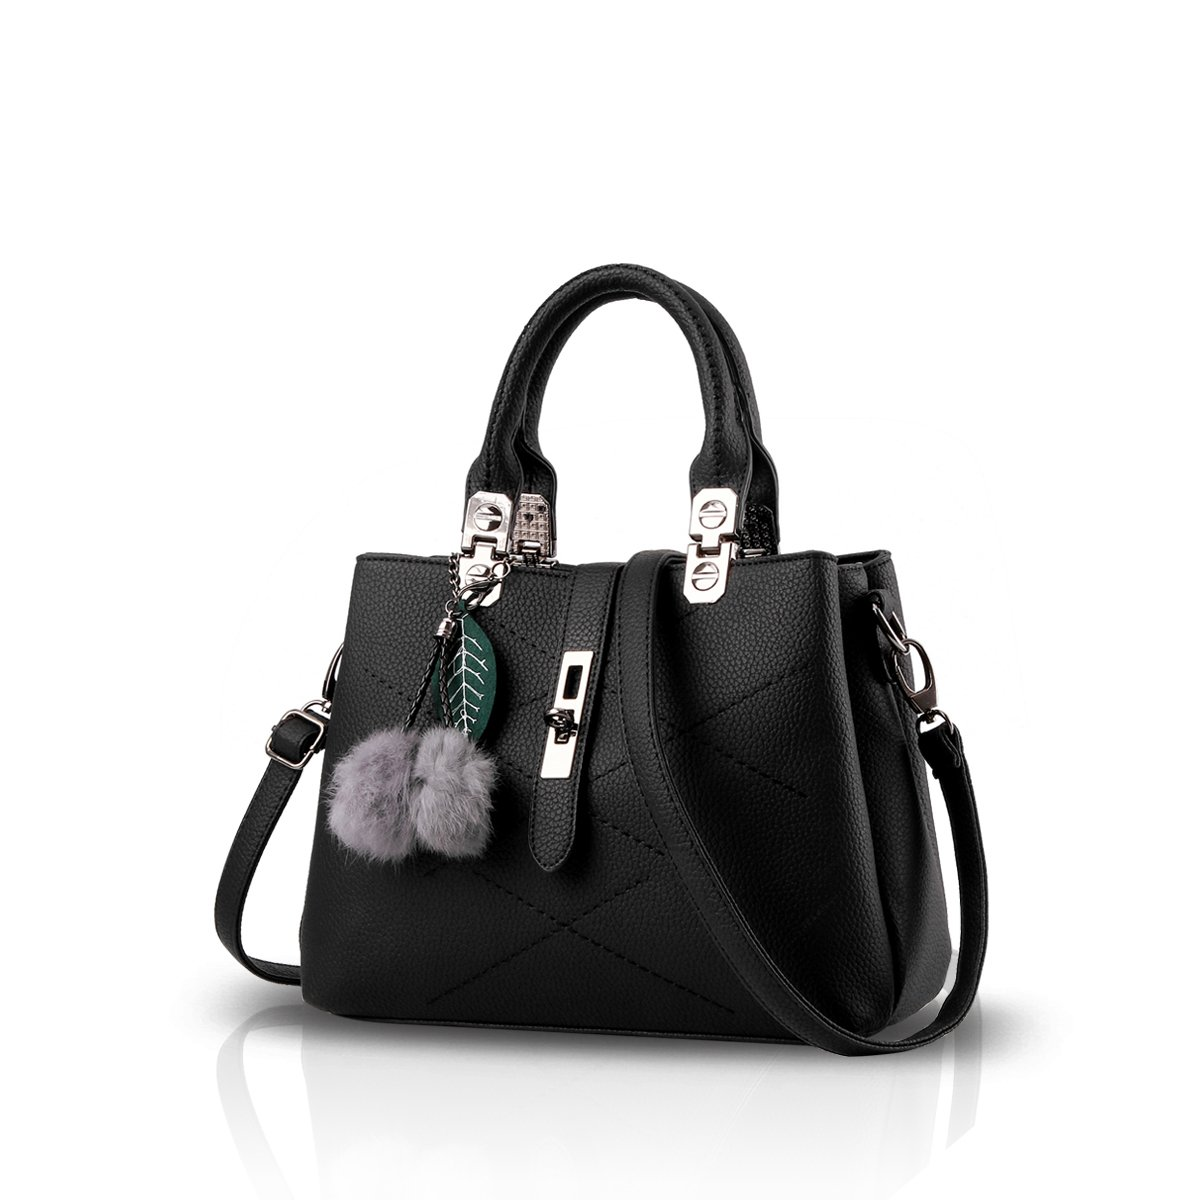 Nicole Doris 2019 New Wave Women Handbags Messenger Bag Ladies Handbag  Female Bag Handbags for Women Black. by NICOLE   DORIS 49ef5b23773e2